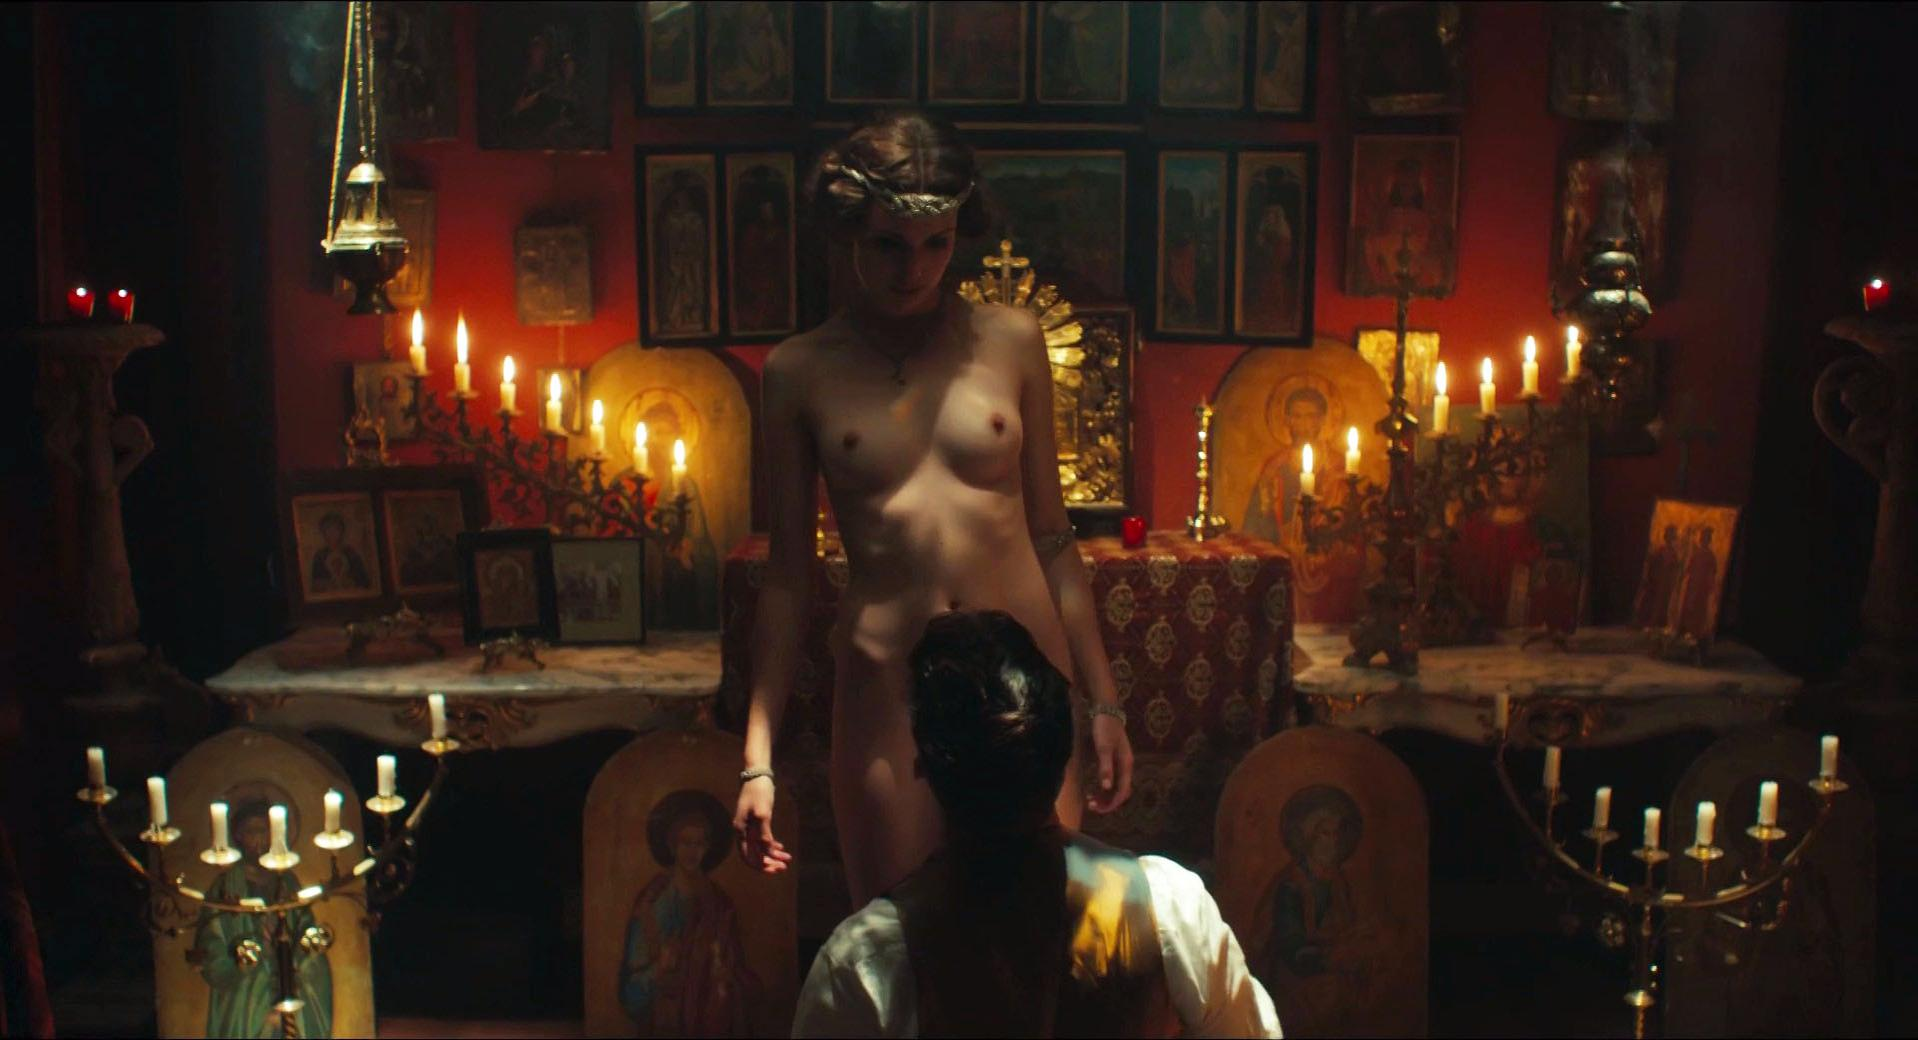 Gaite Jansen nude - Peaky Blinders s03e05 (2016)